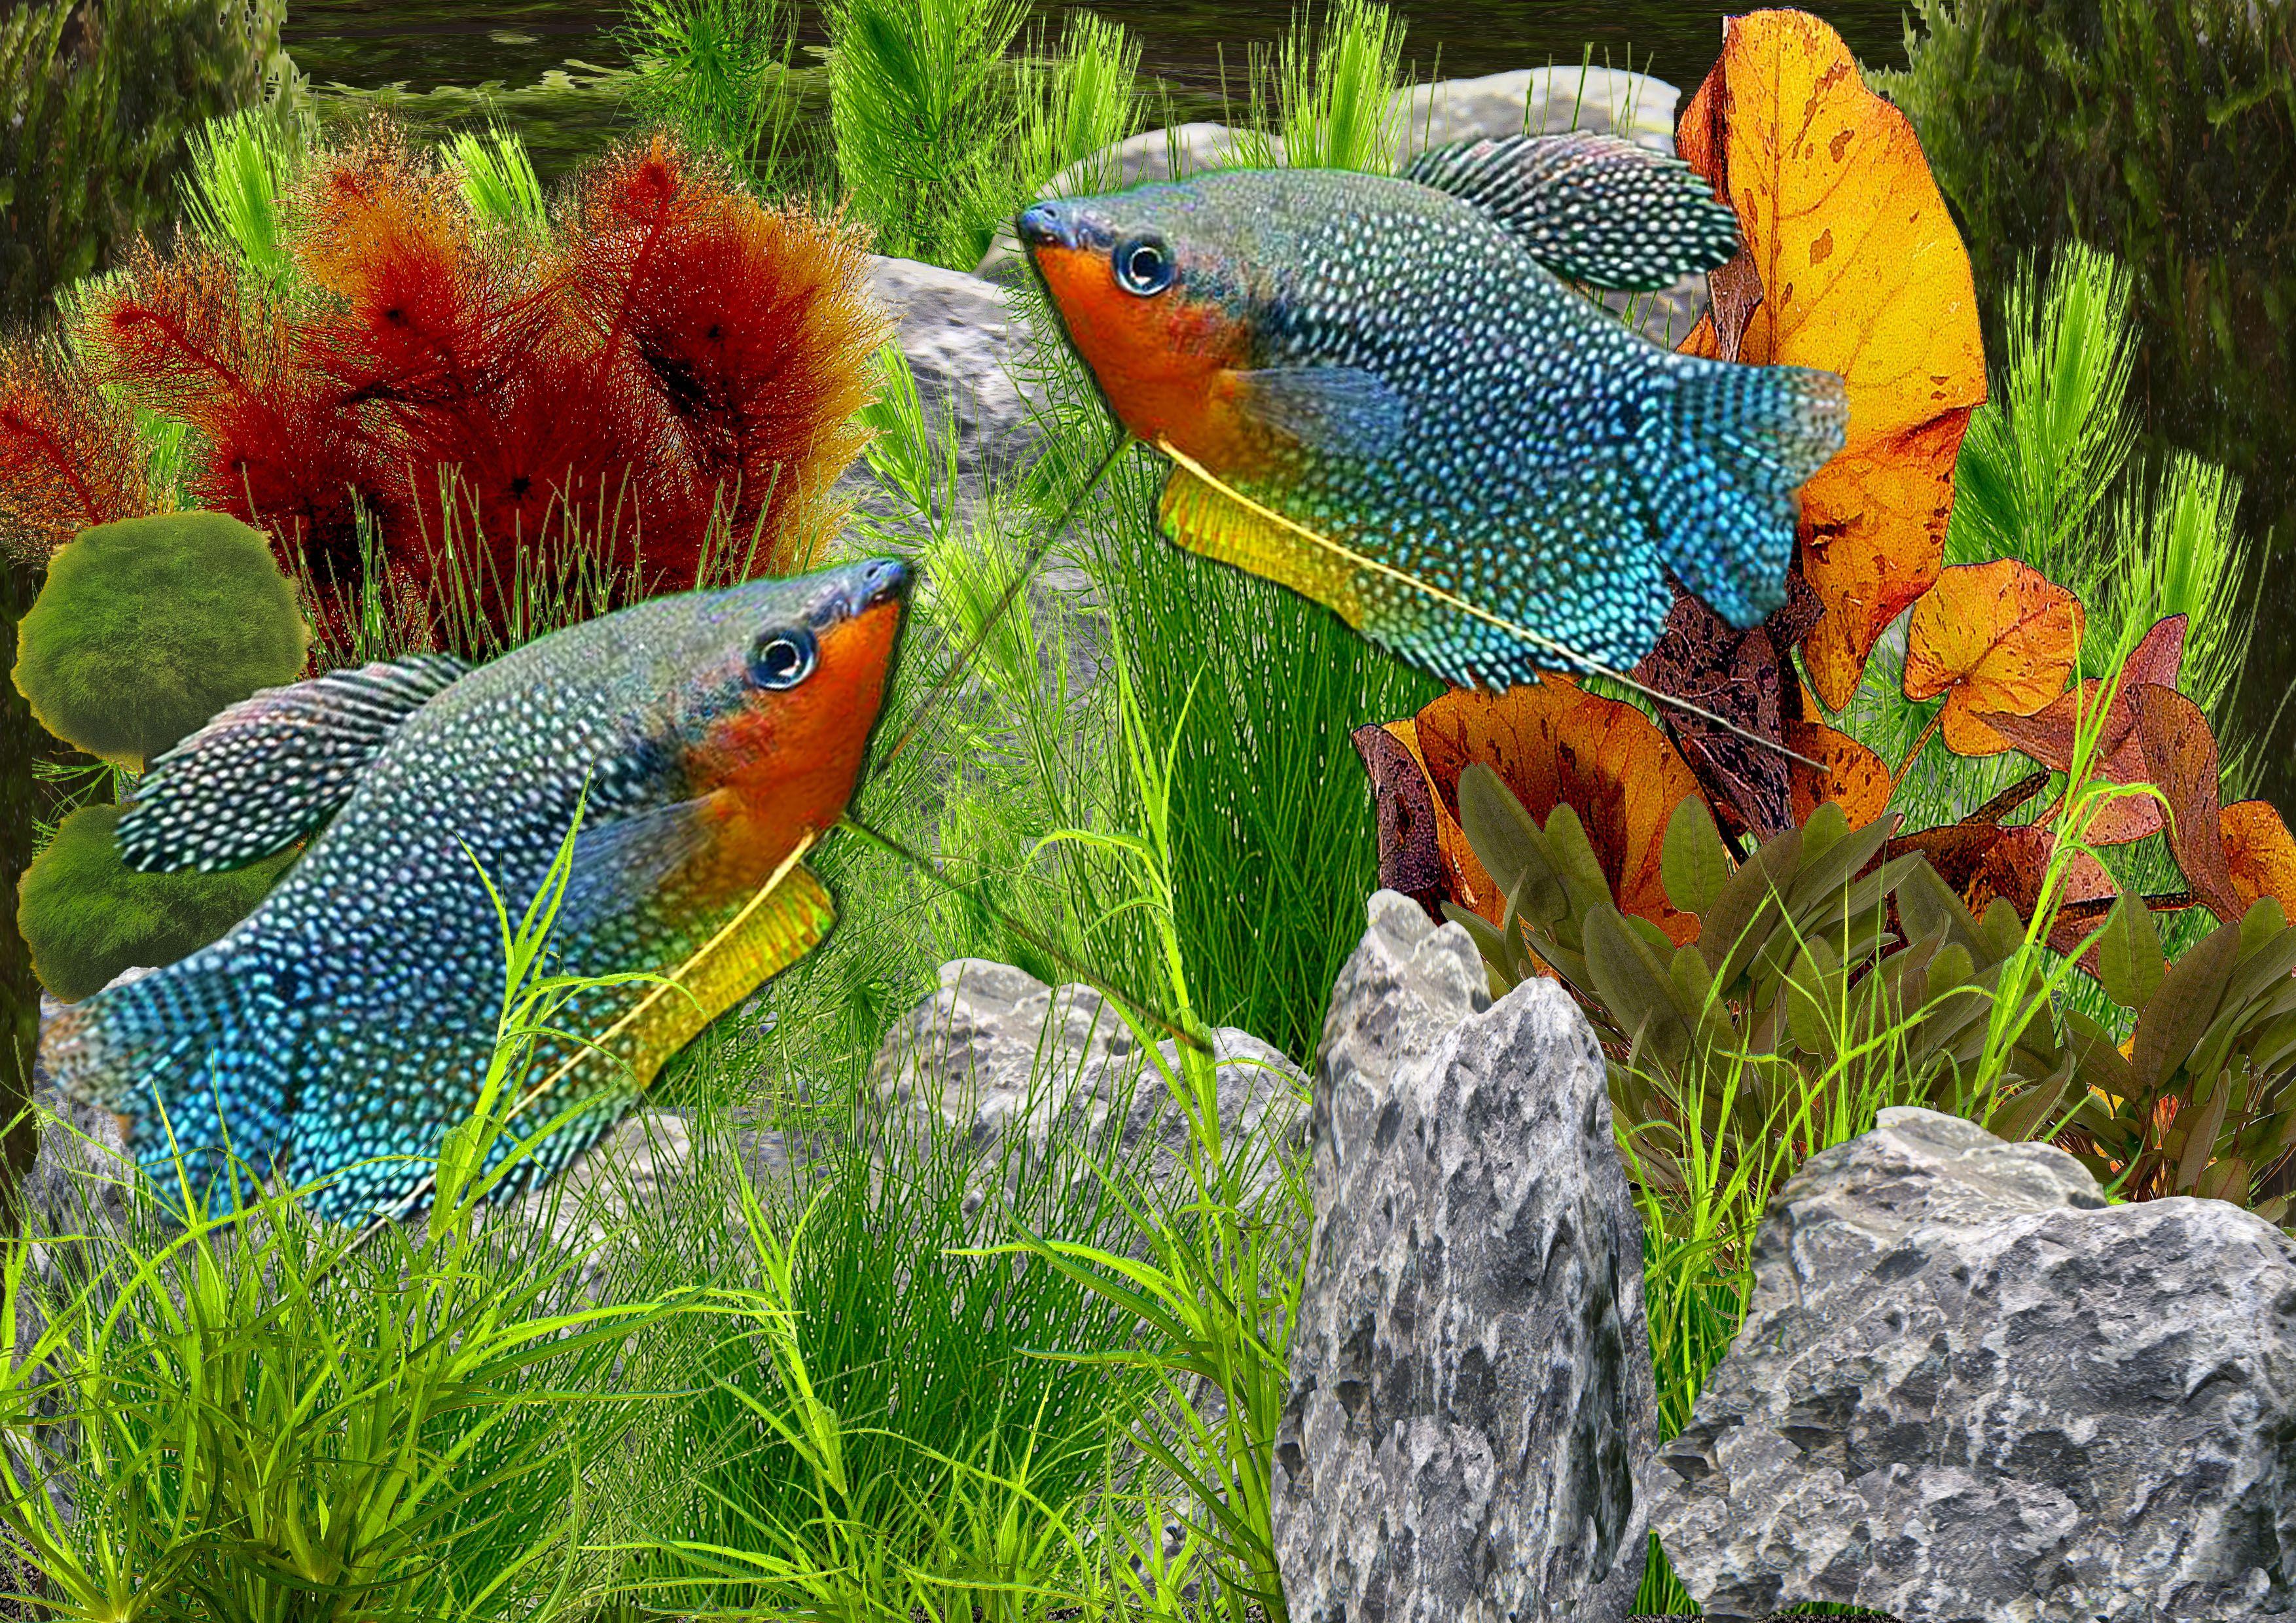 Animals Aquatic Class Freshwater Guide Platy Tropical Platy Class Guide Tropical Freshwa Aquarium Fish Tropical Freshwater Fish Tropical Fish Aquarium